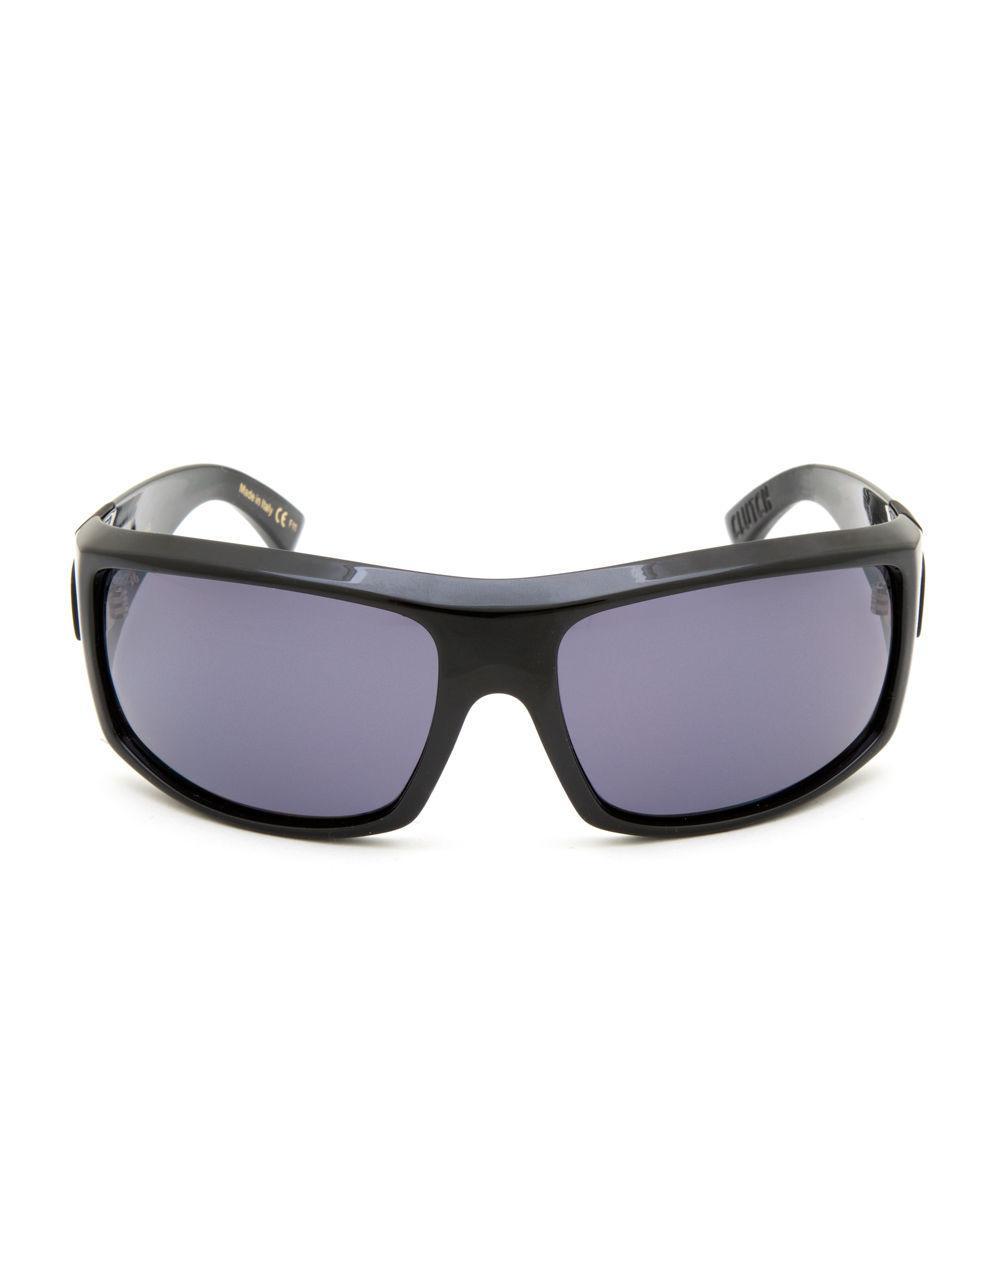 45bd3e9d4e3 Lyst - Von Zipper Clutch Polarized Sunglasses for Men